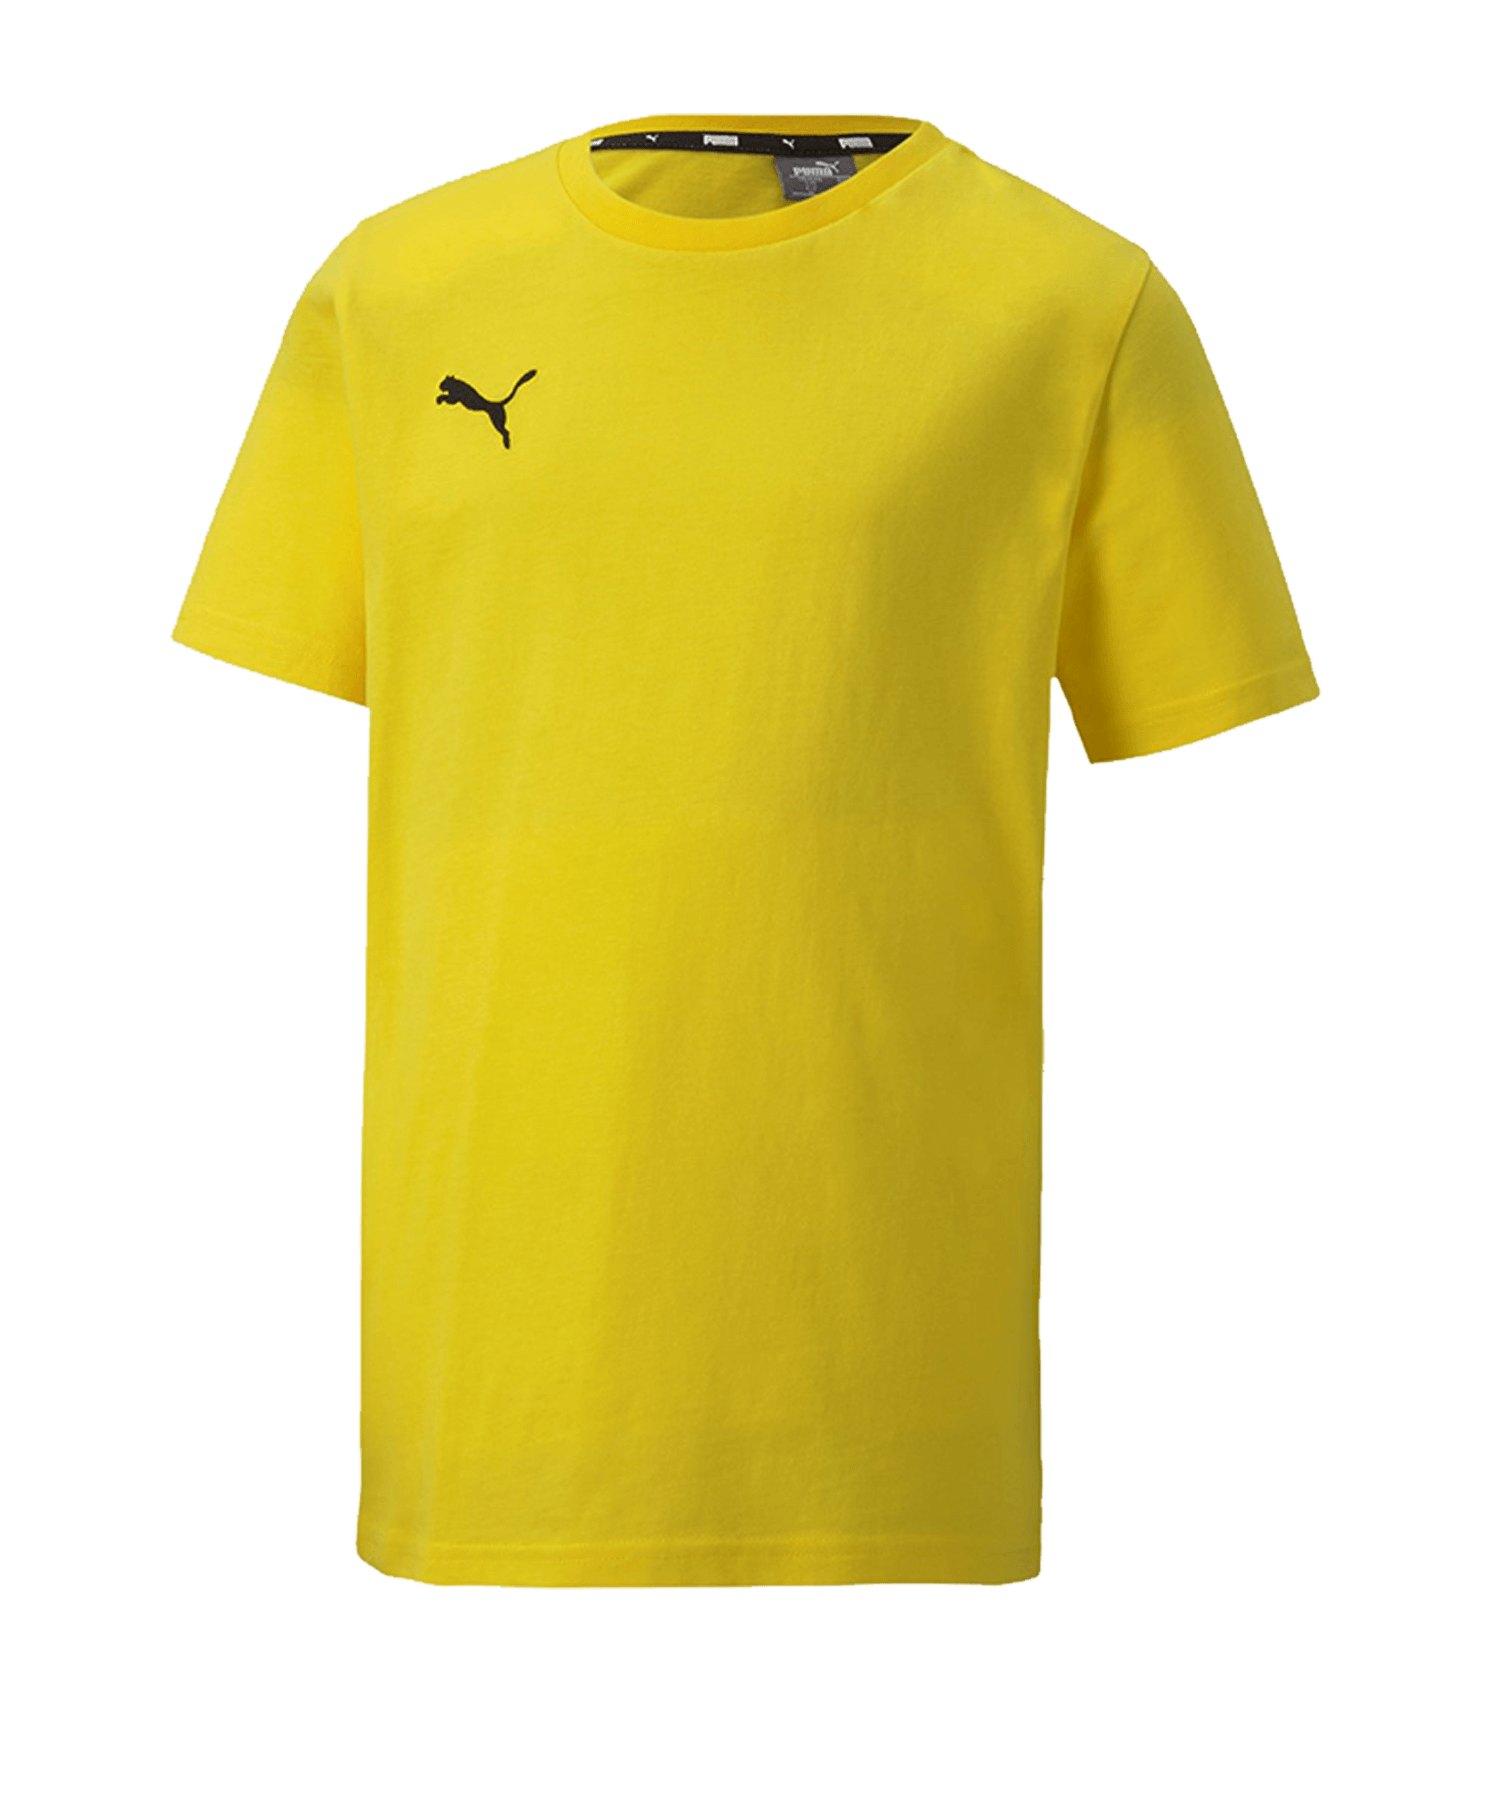 PUMA teamGOAL 23 Casuals Tee T-Shirt Kids Gelb F07 - gelb